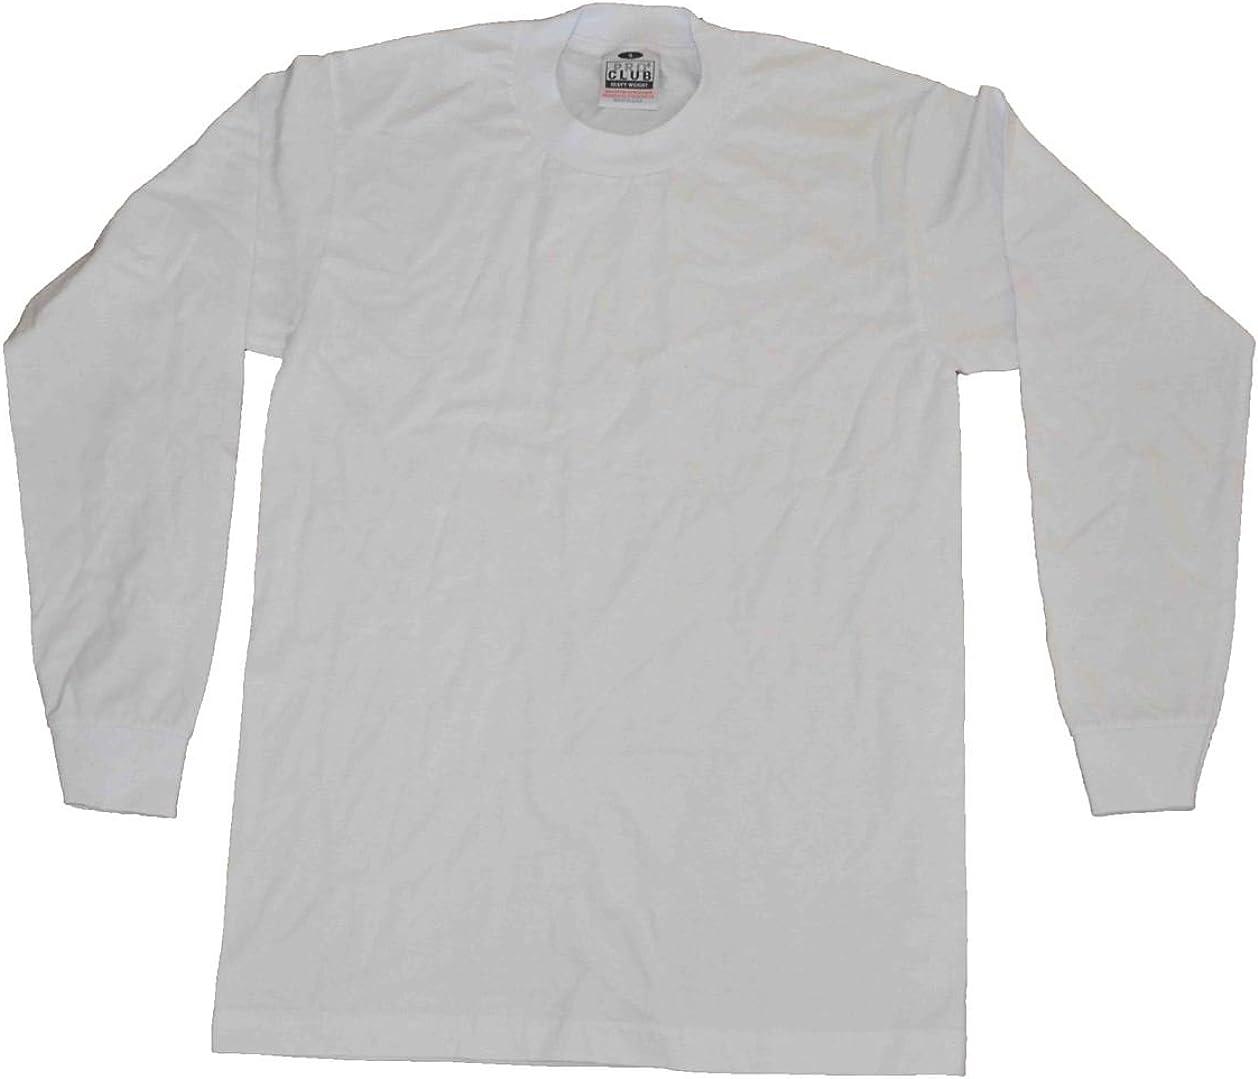 Pro Club Long Sleeve Shirt 100/%cotton Heavy Weight-black